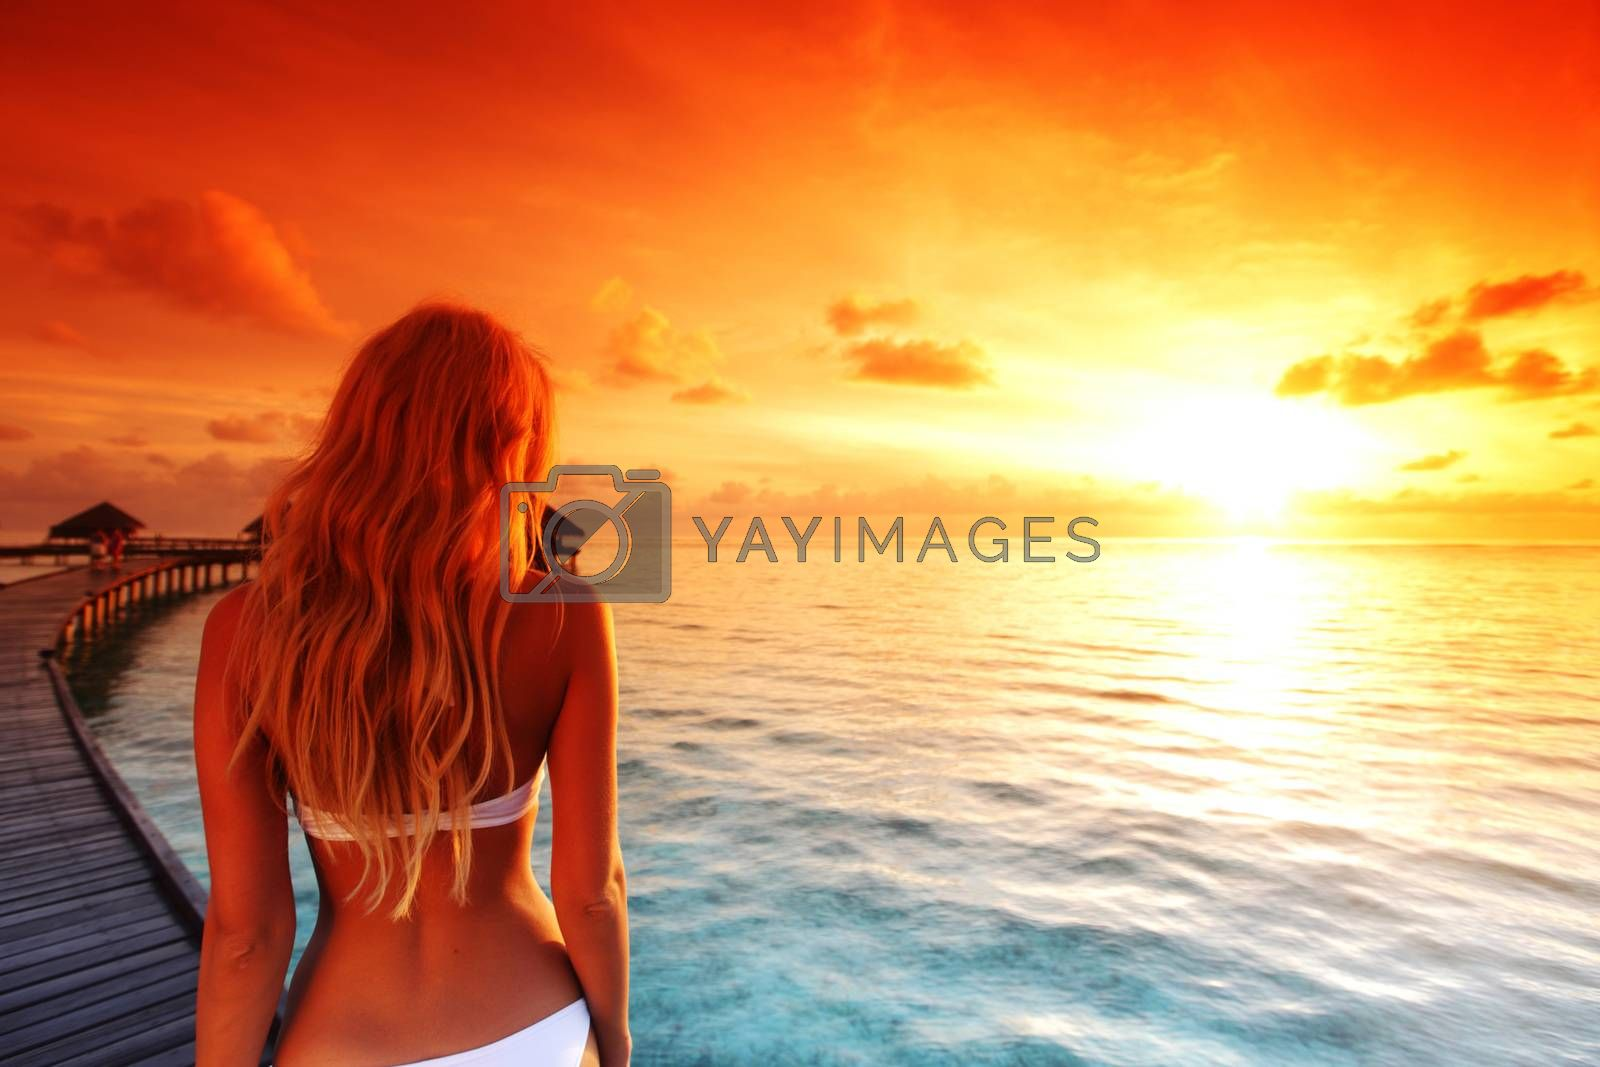 woman in bikini on a bridge home sea and the maldivian sunset on the background